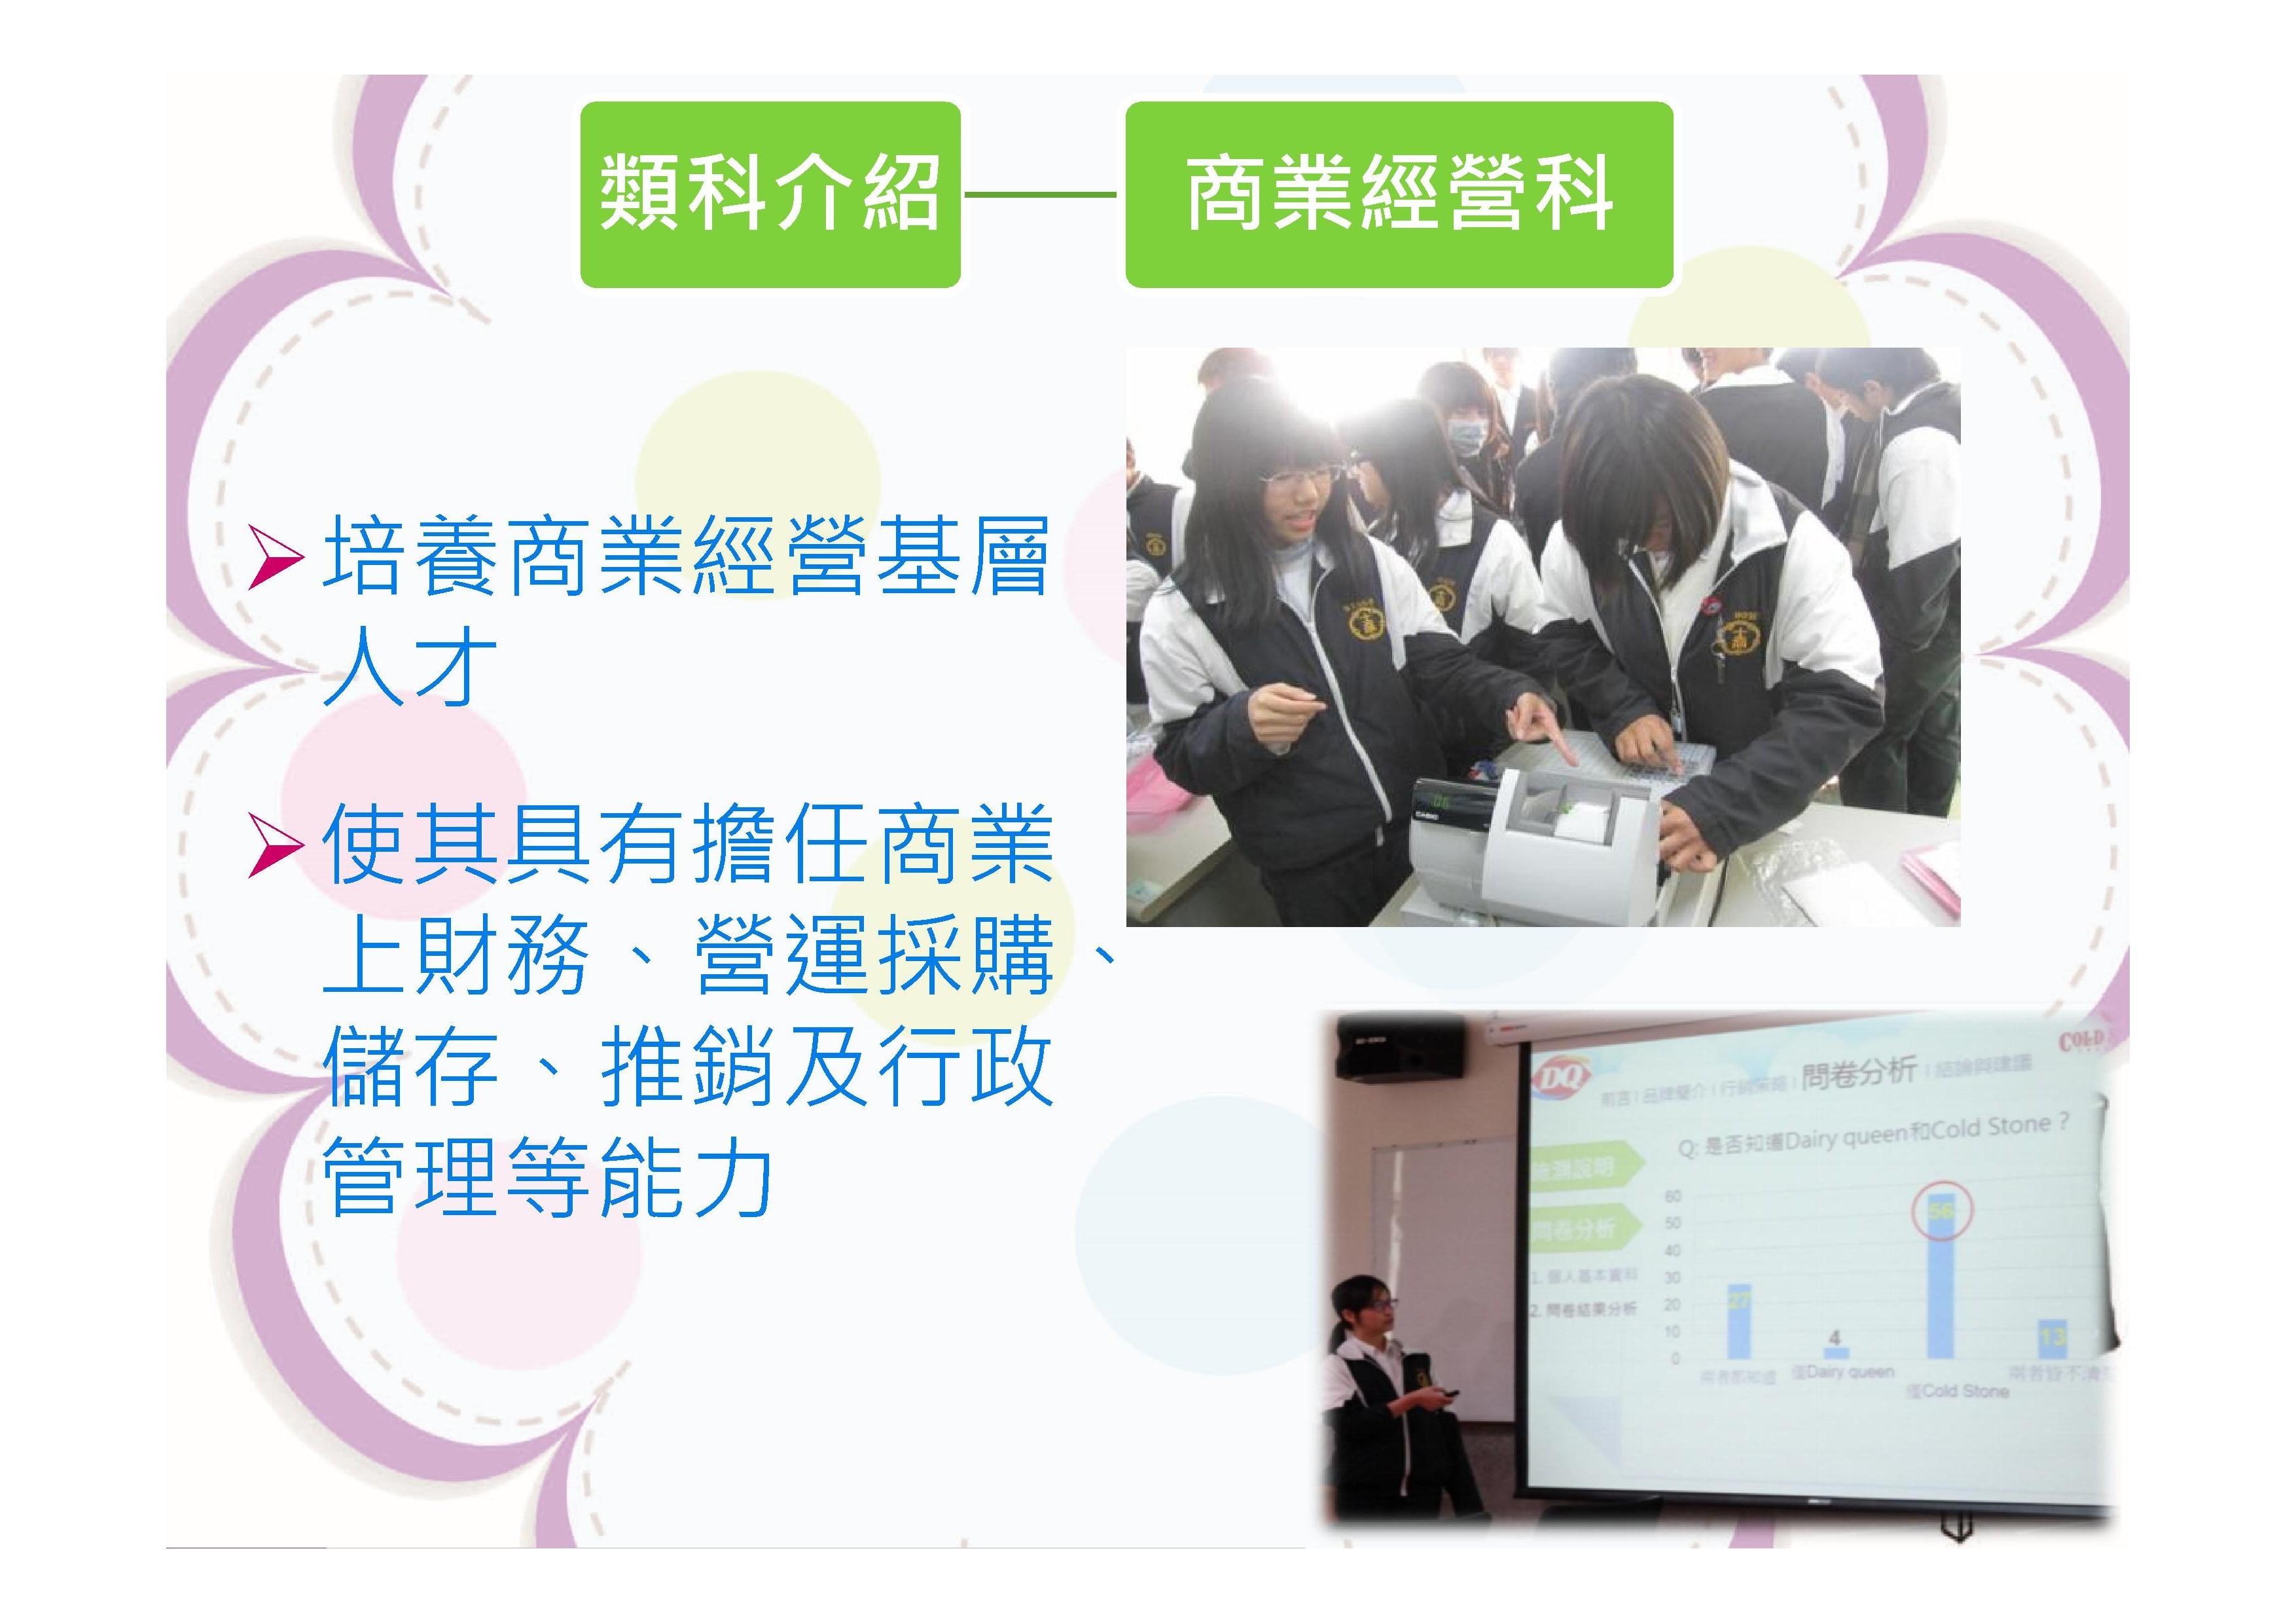 Microsoft PowerPoint - 技職教育暨士商簡介.pptx00013